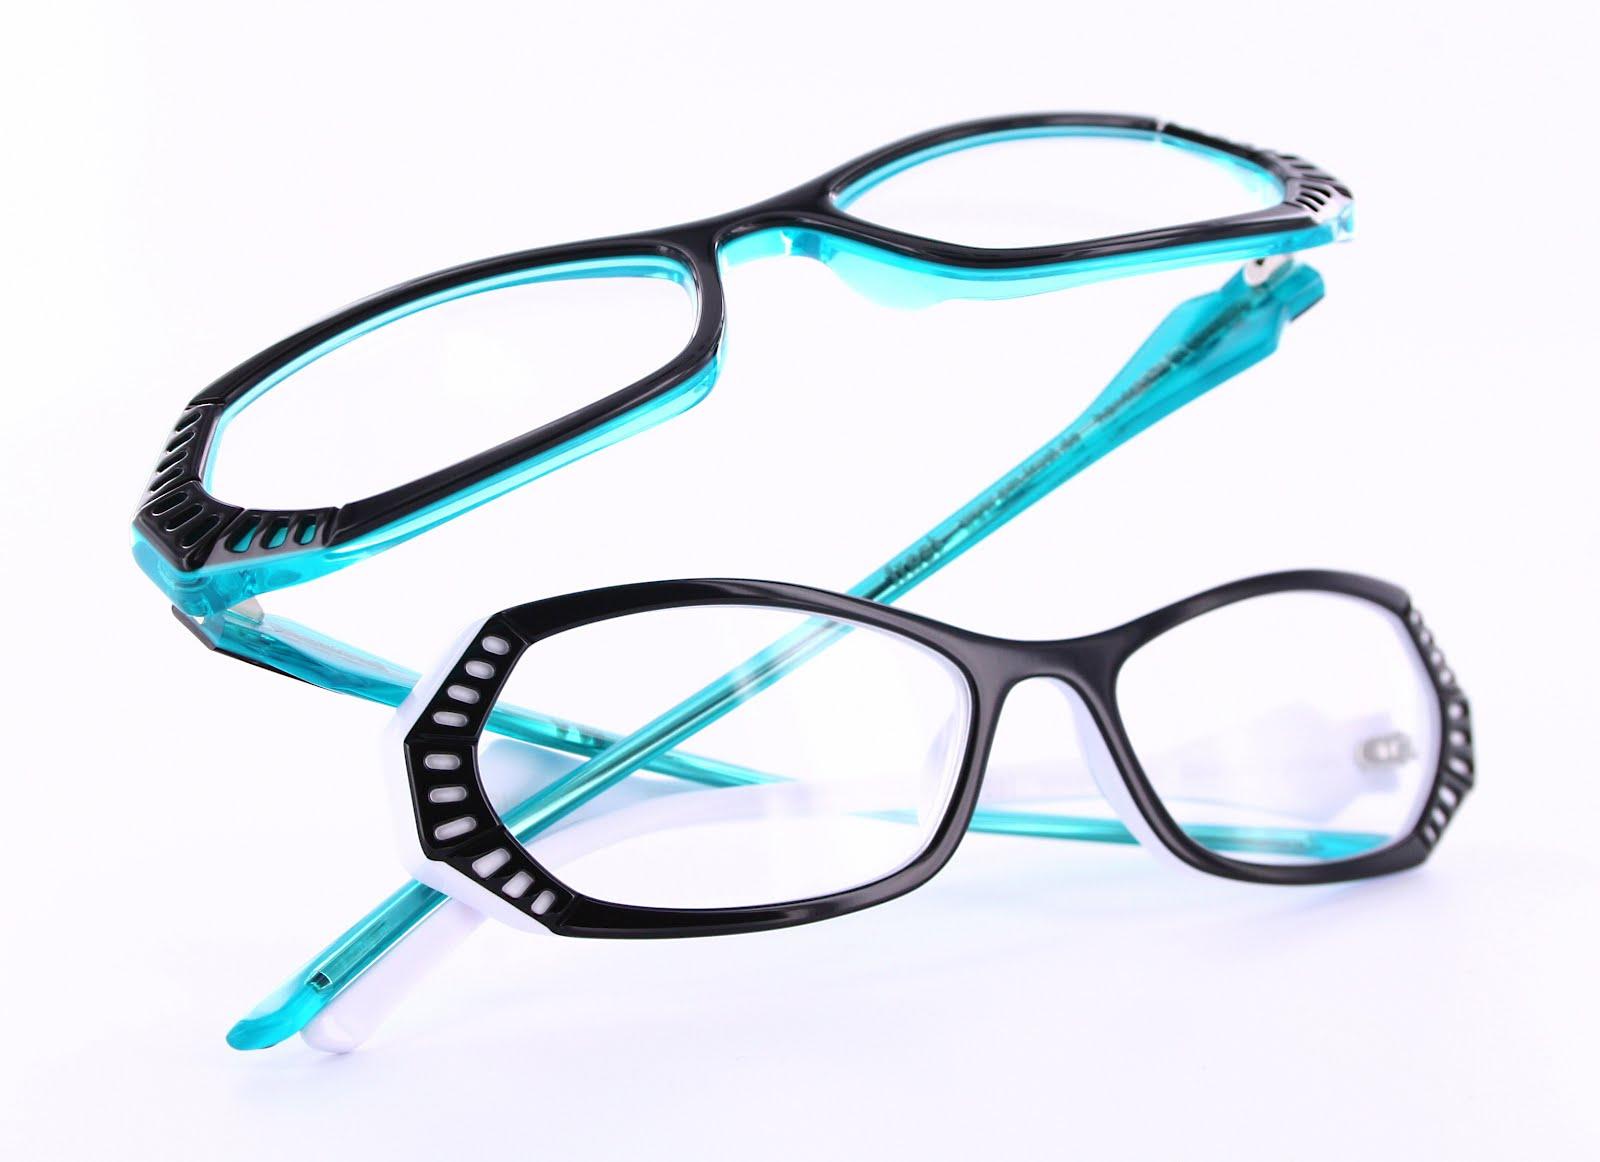 erkers eyewear introducing eyewear exclusively